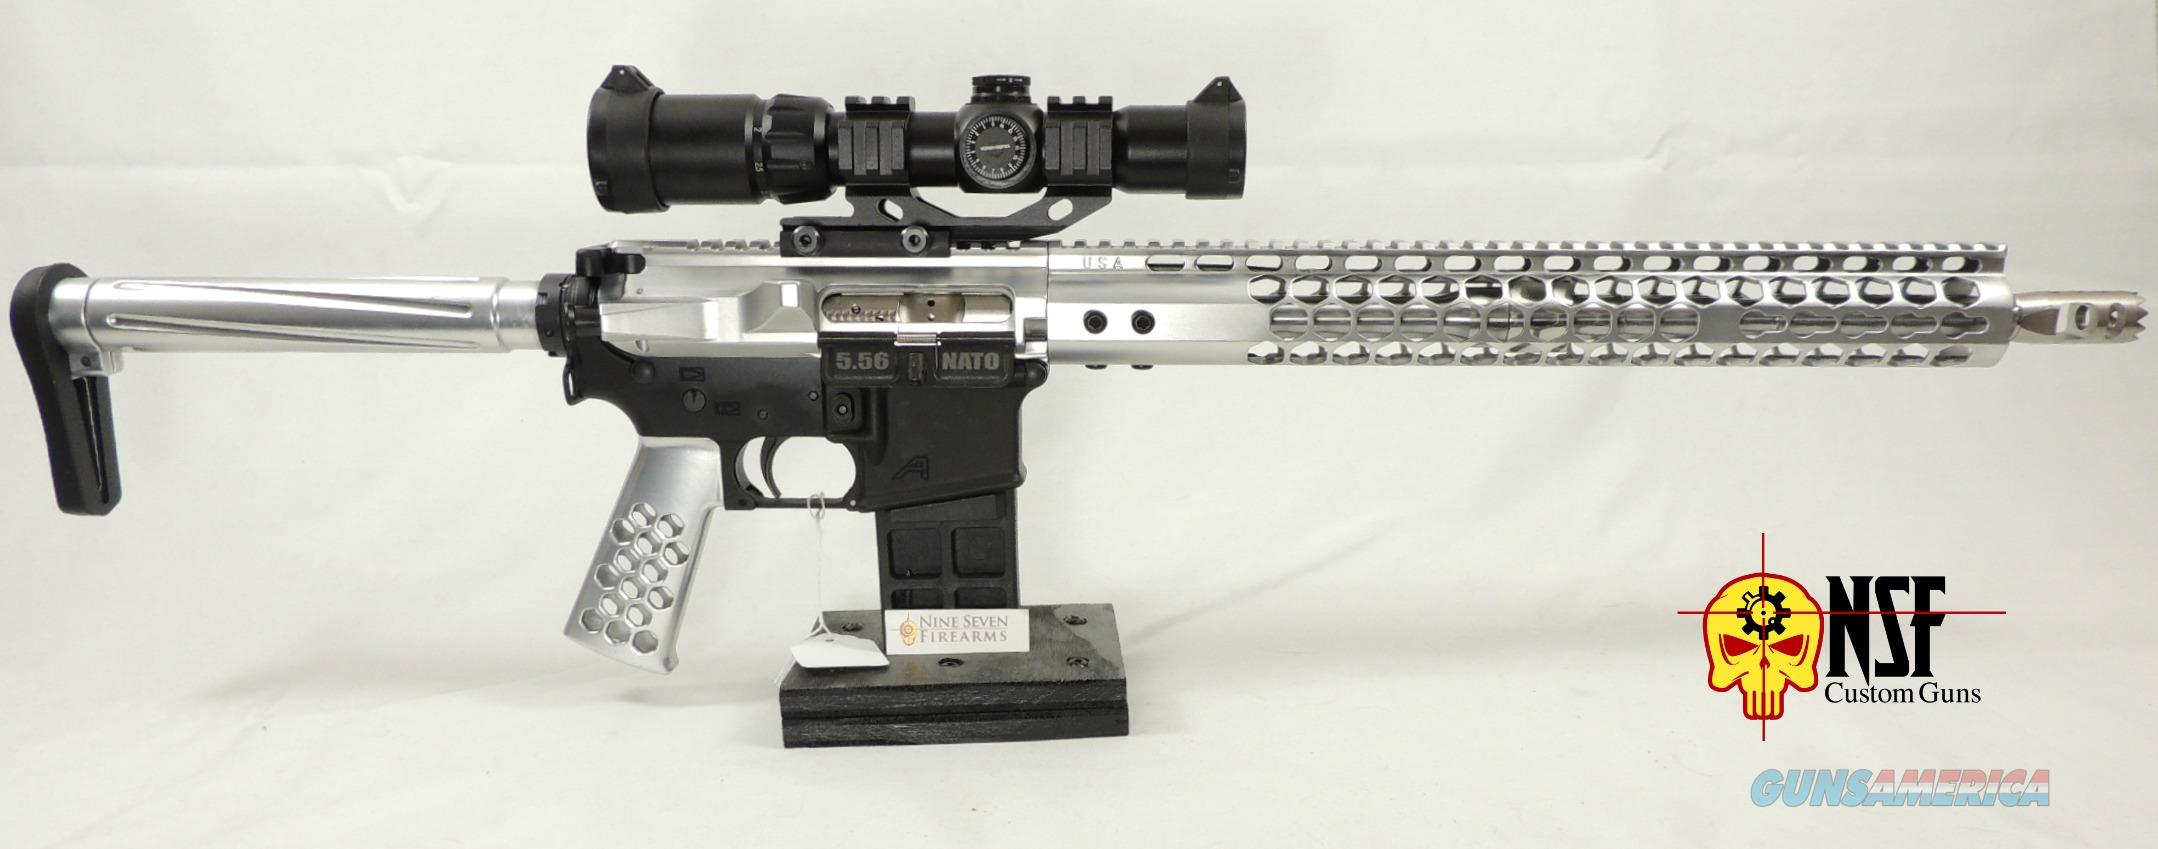 Limited Edition Polished Aluminum AR-15 NSF Custom Guns 5 56 Rifle 223